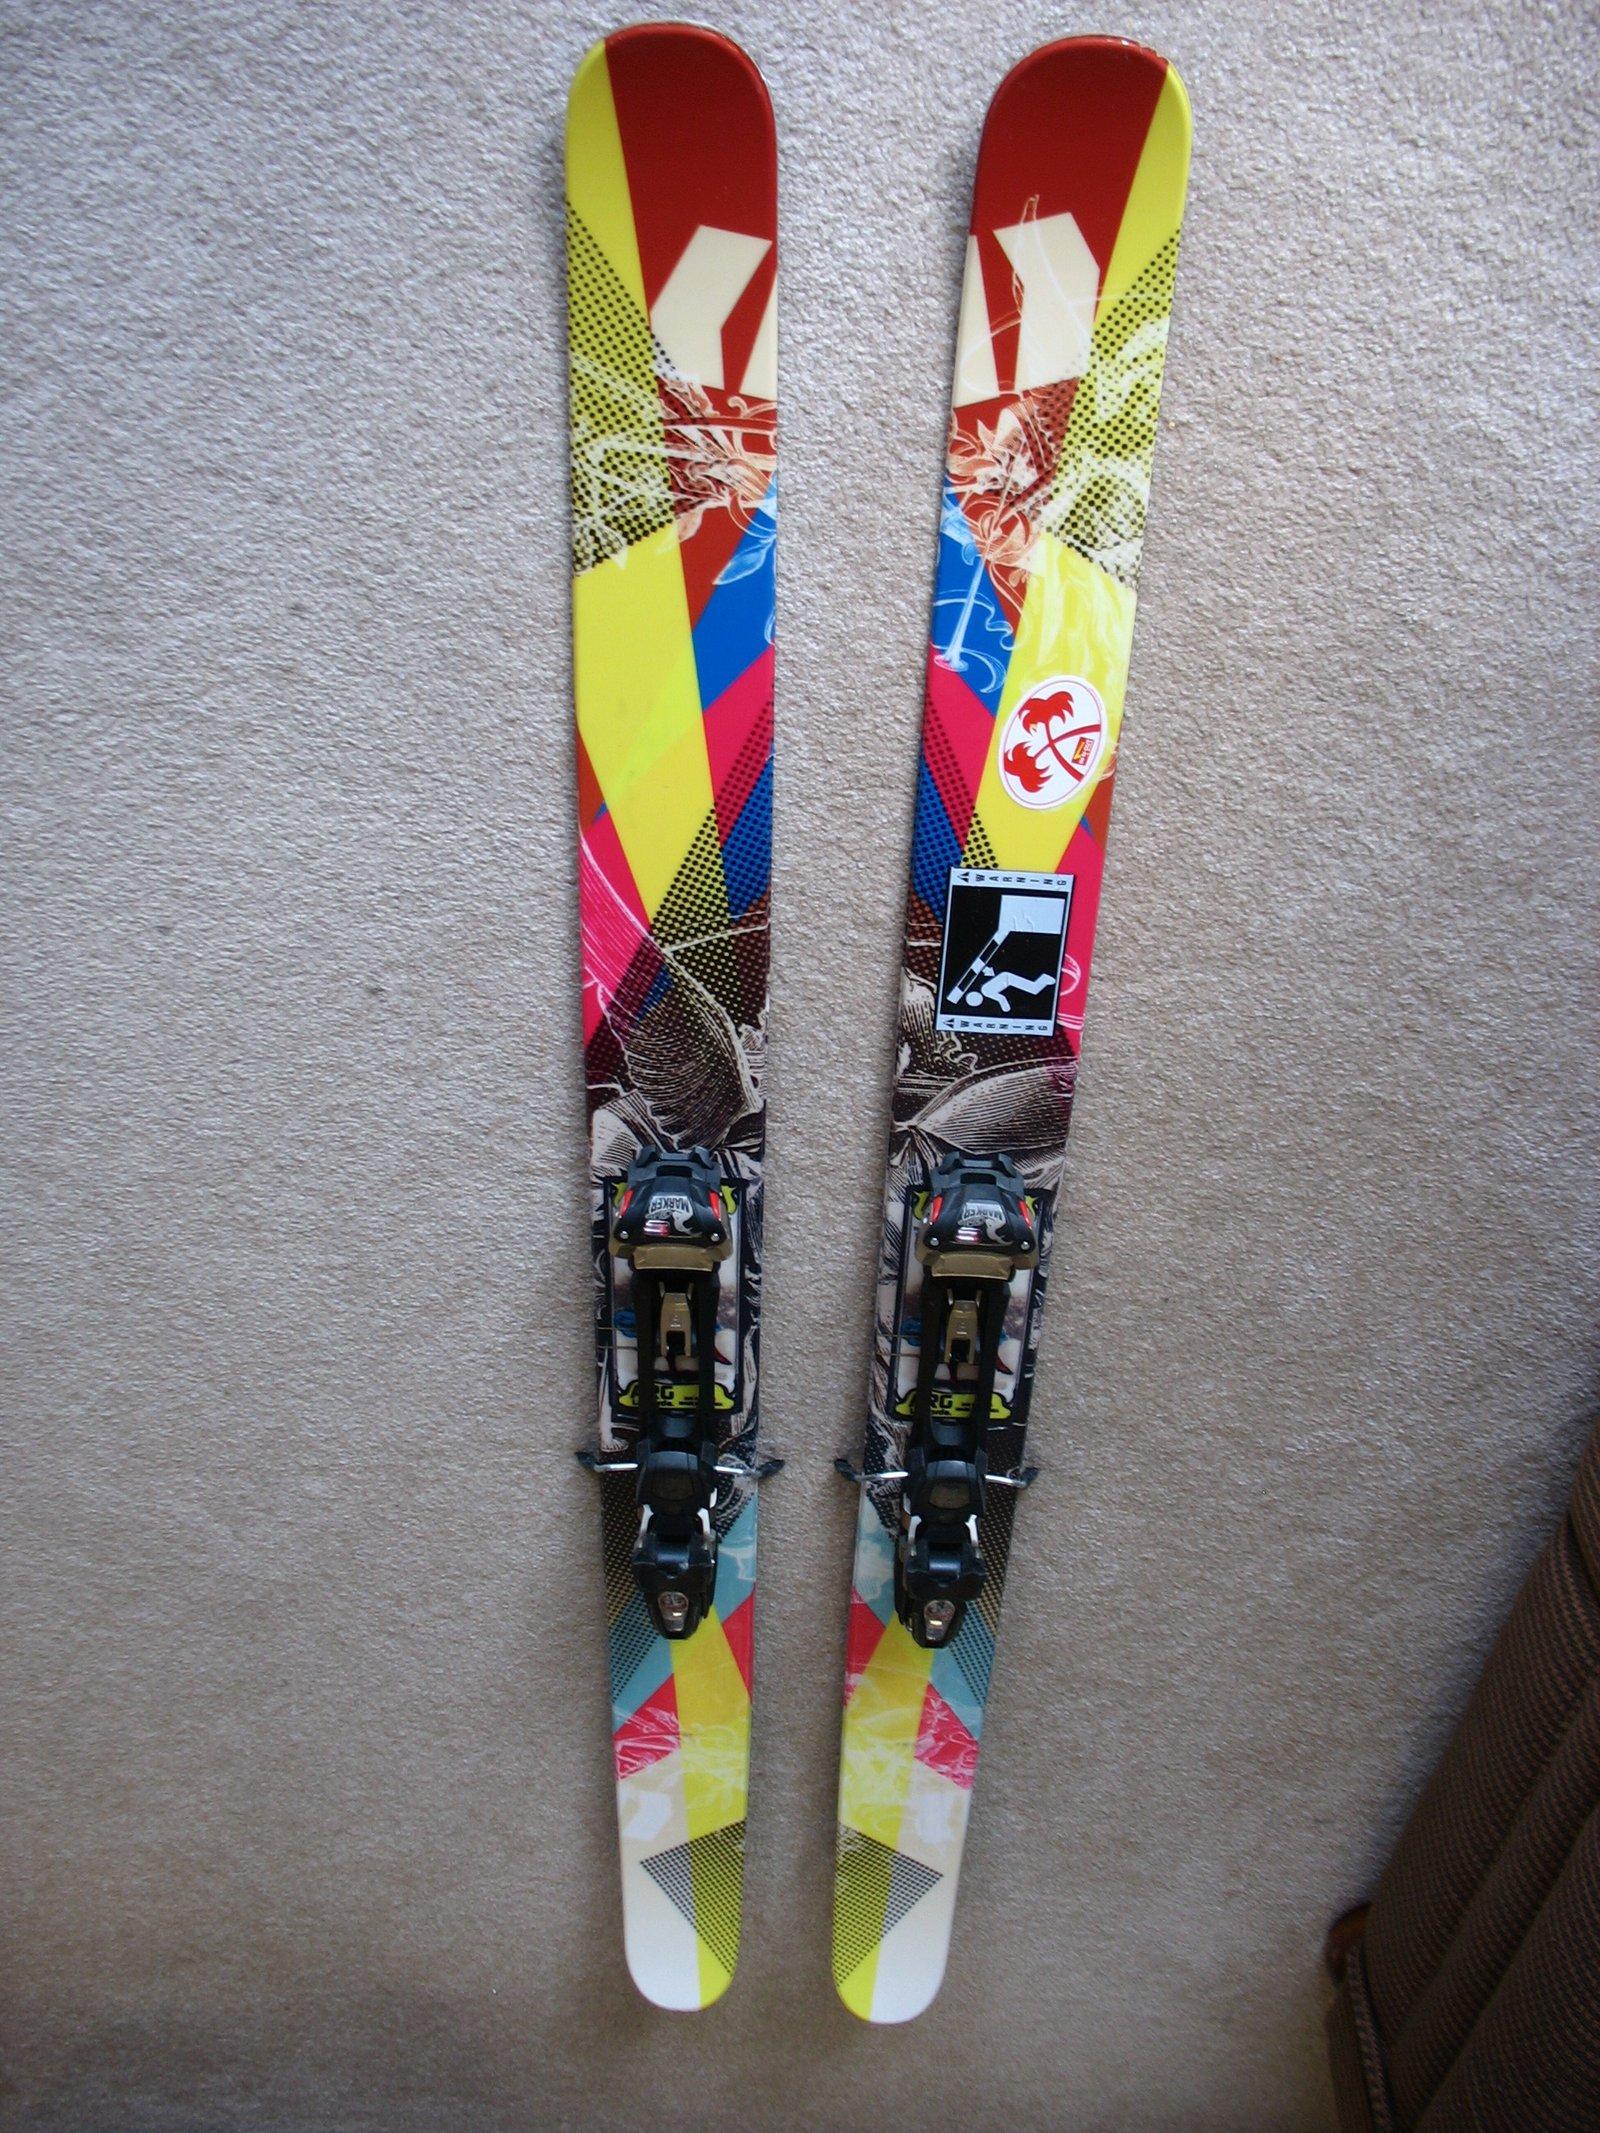 ARG skis